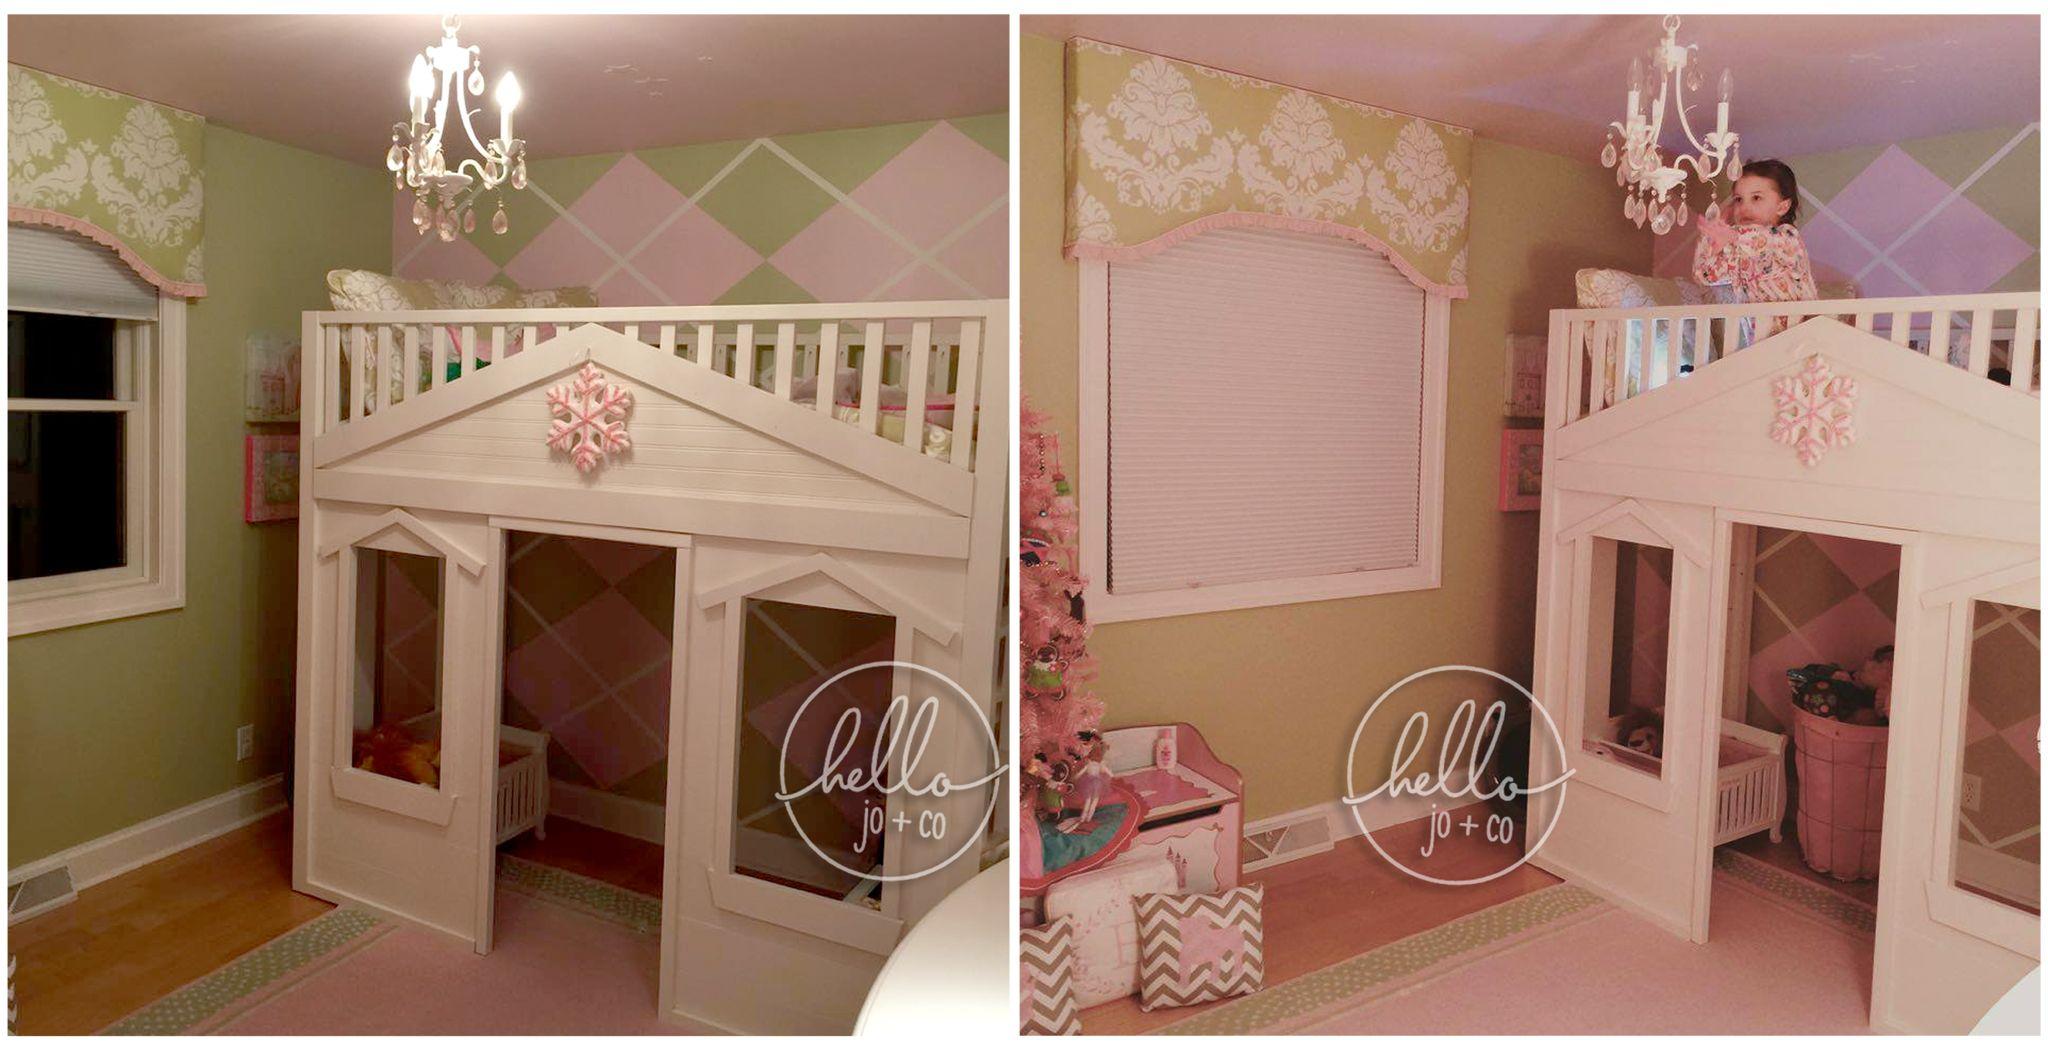 hello jo + co twin cottage loft we make custom beds